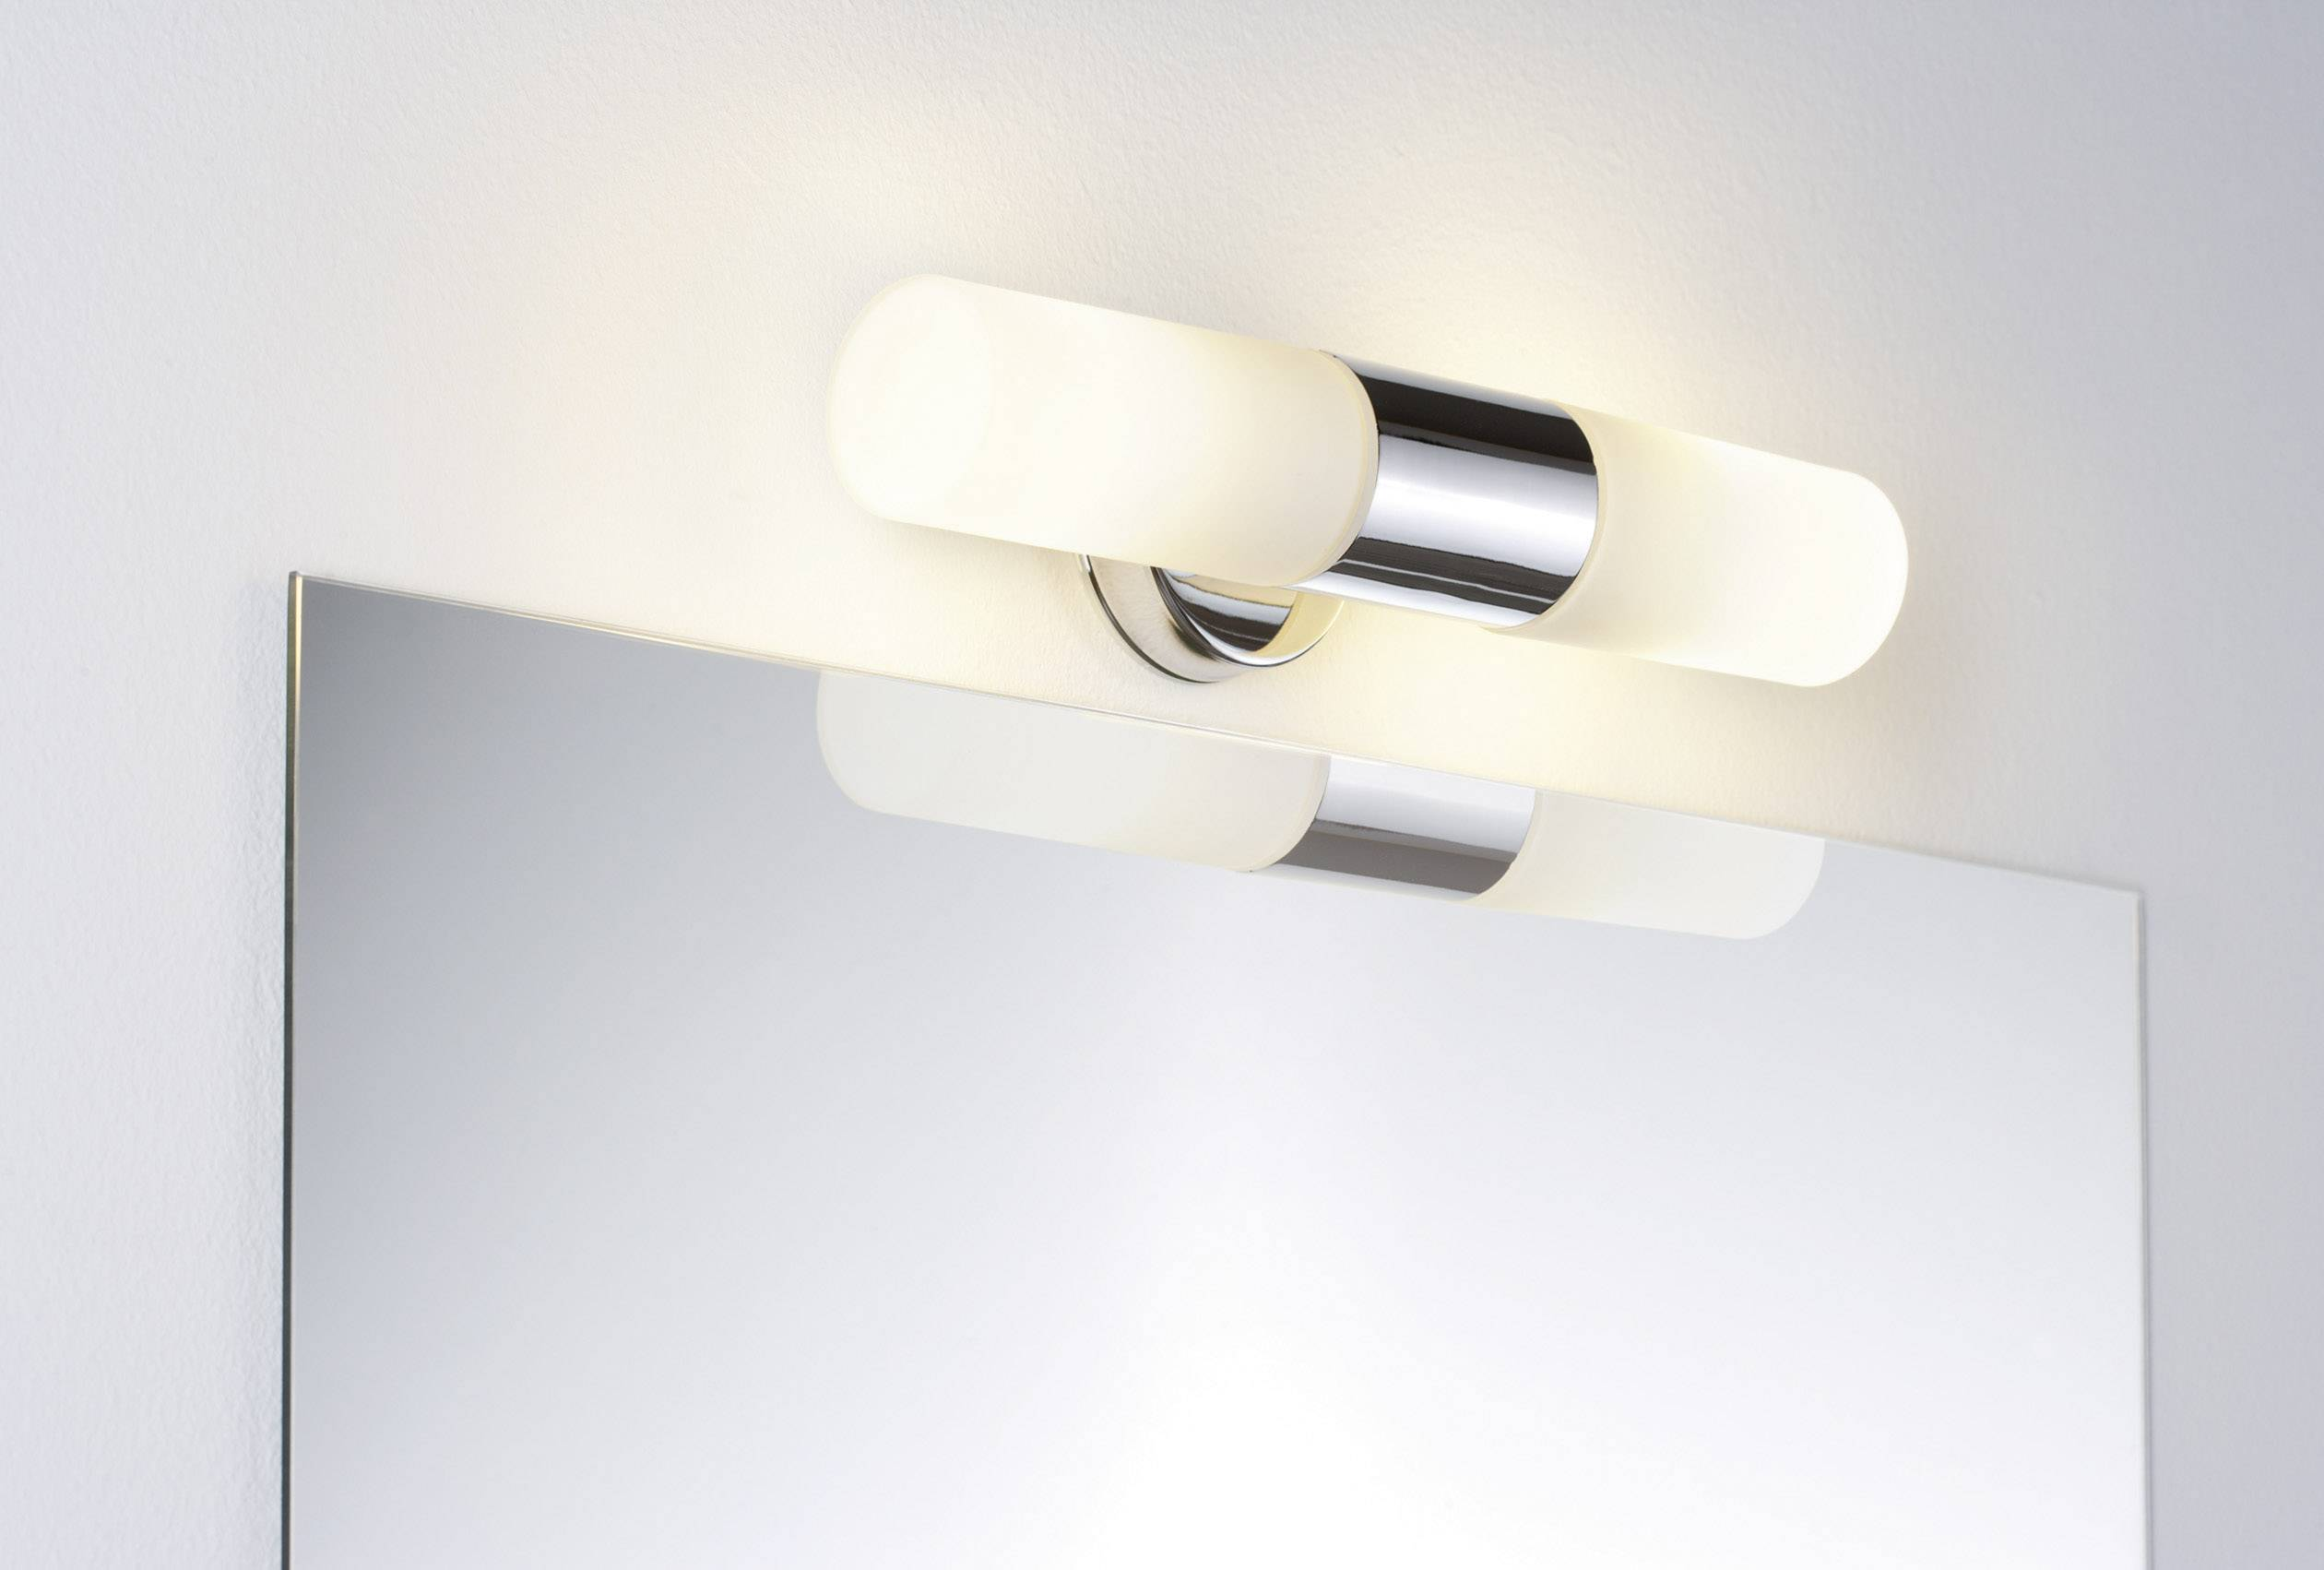 Badkamer Wandlamp Chroom : Badkamer wandlamp led halogeen e14 40 w paulmann lenia 70350 chroom